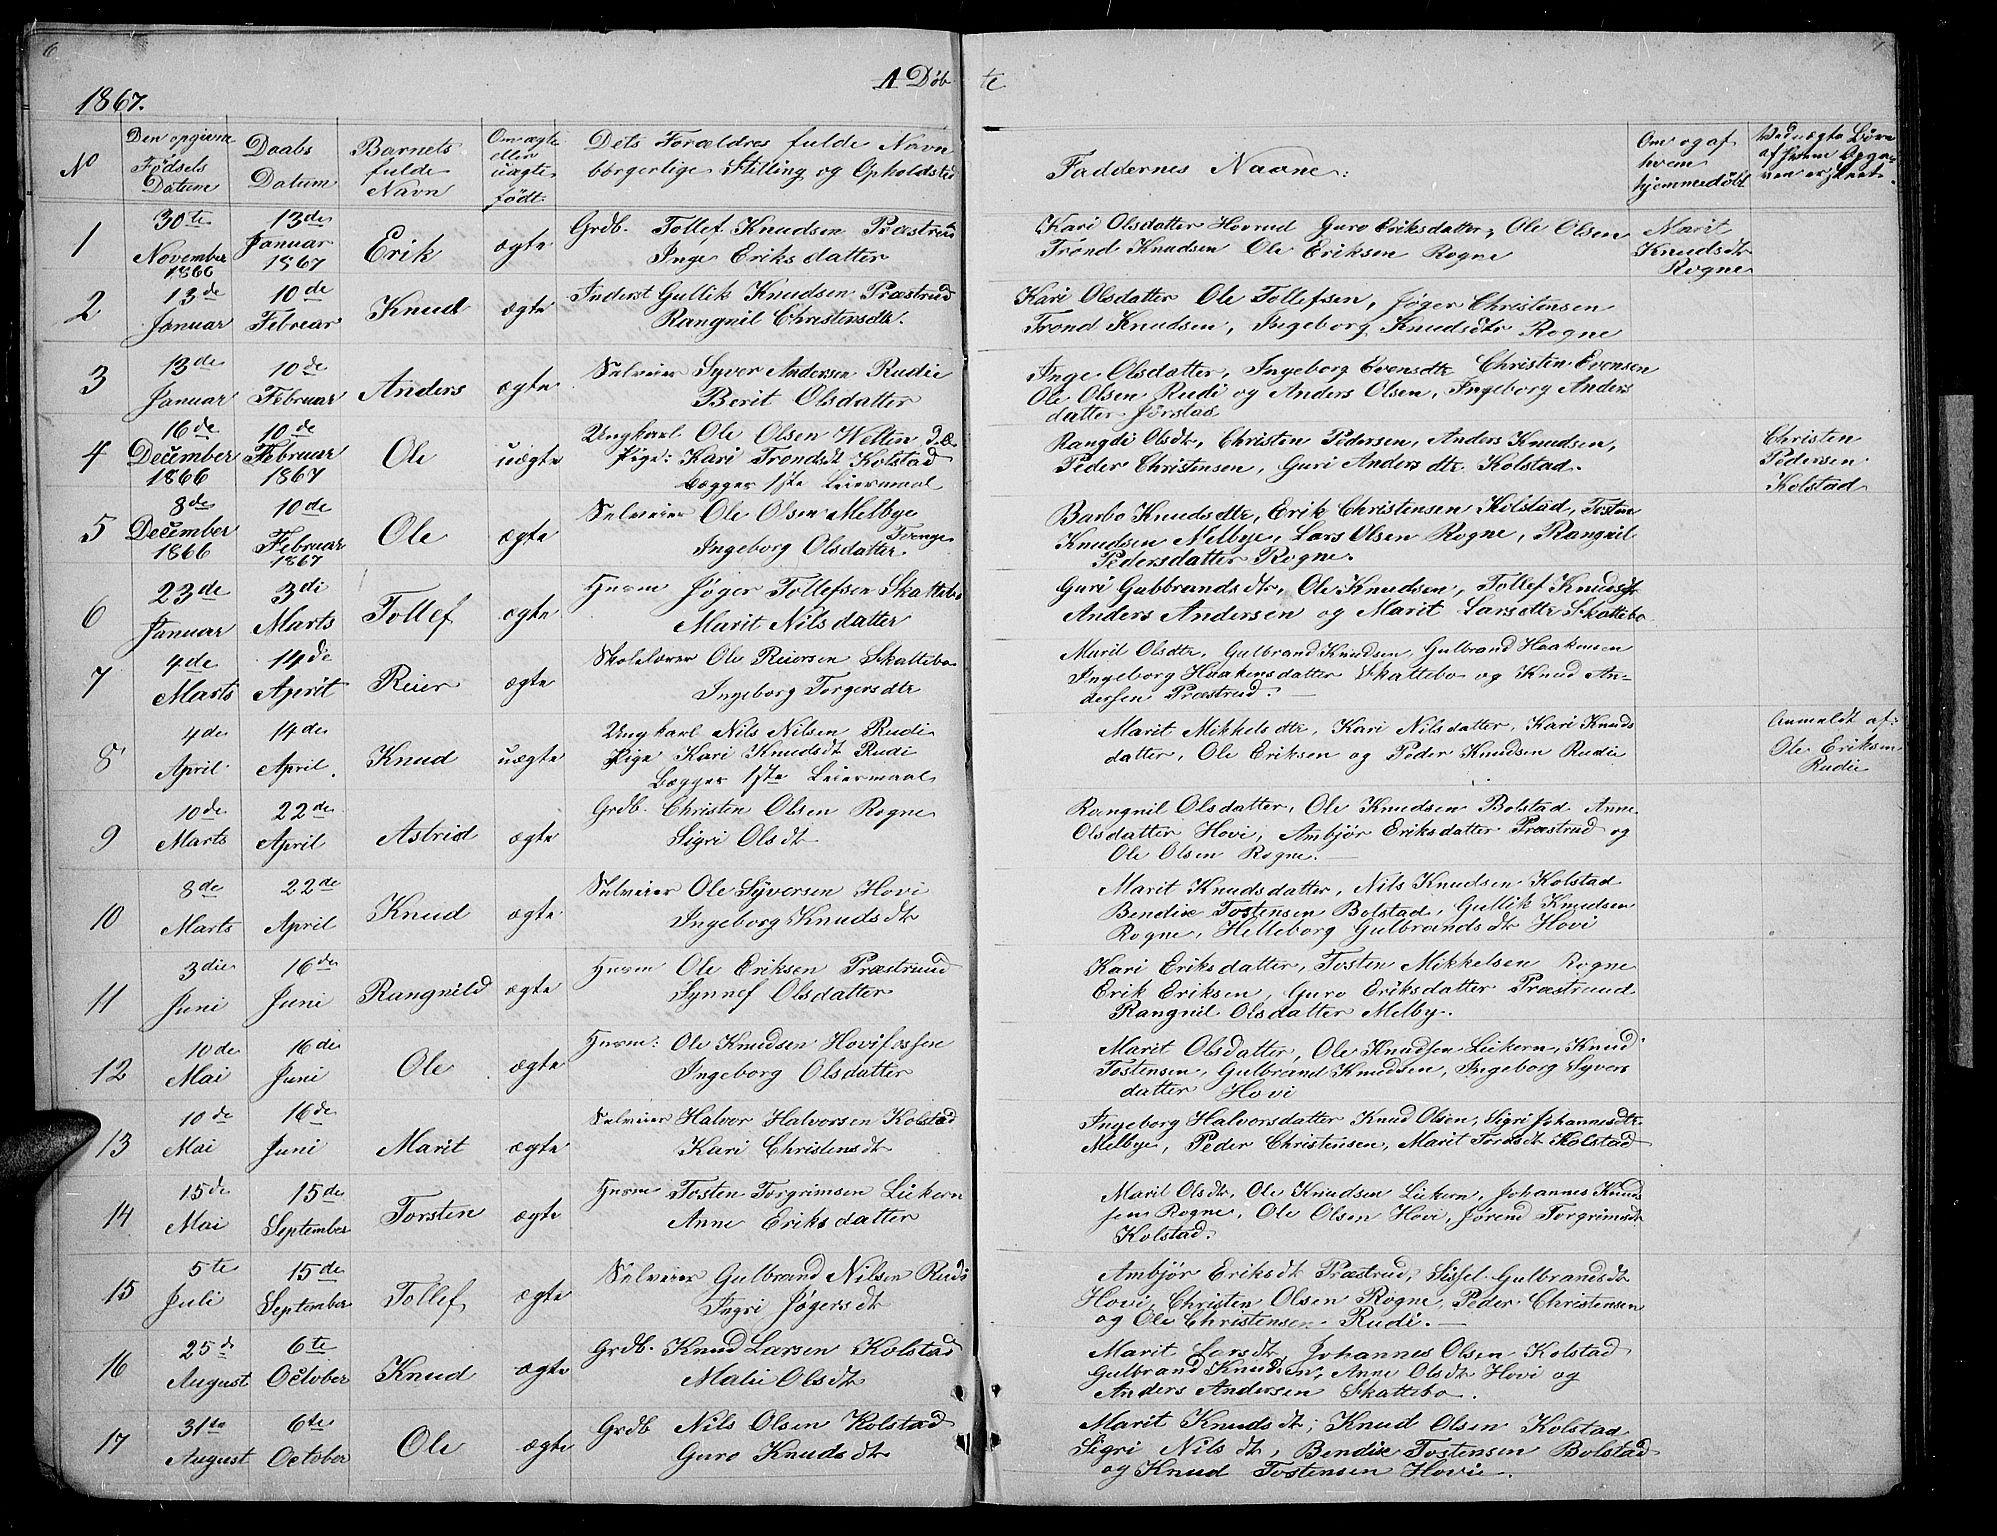 SAH, Øystre Slidre prestekontor, Klokkerbok nr. 3, 1866-1886, s. 6-7